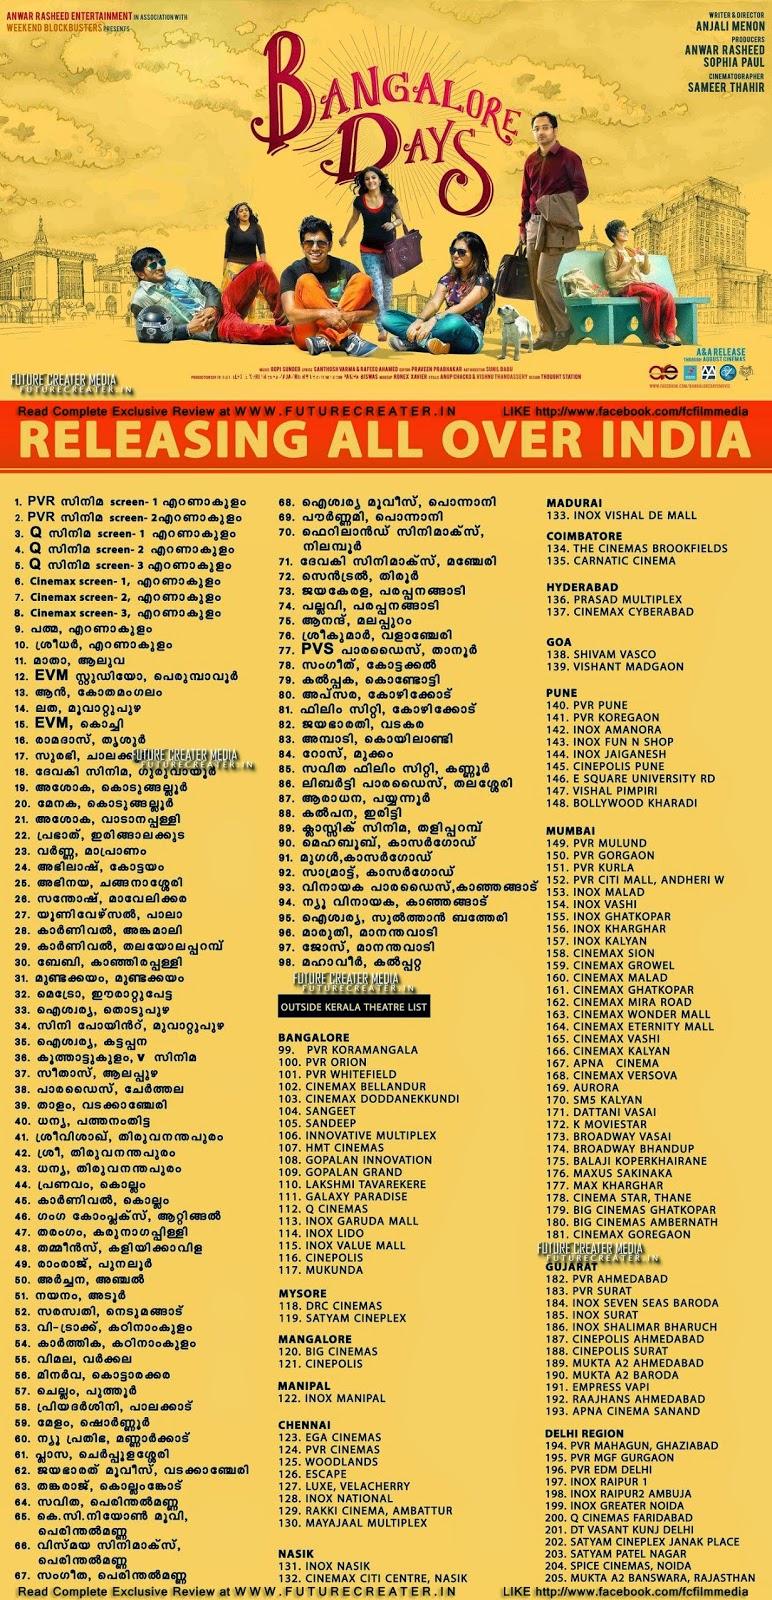 Bangalore Days theater list | Bangalore Days Releasing Centers